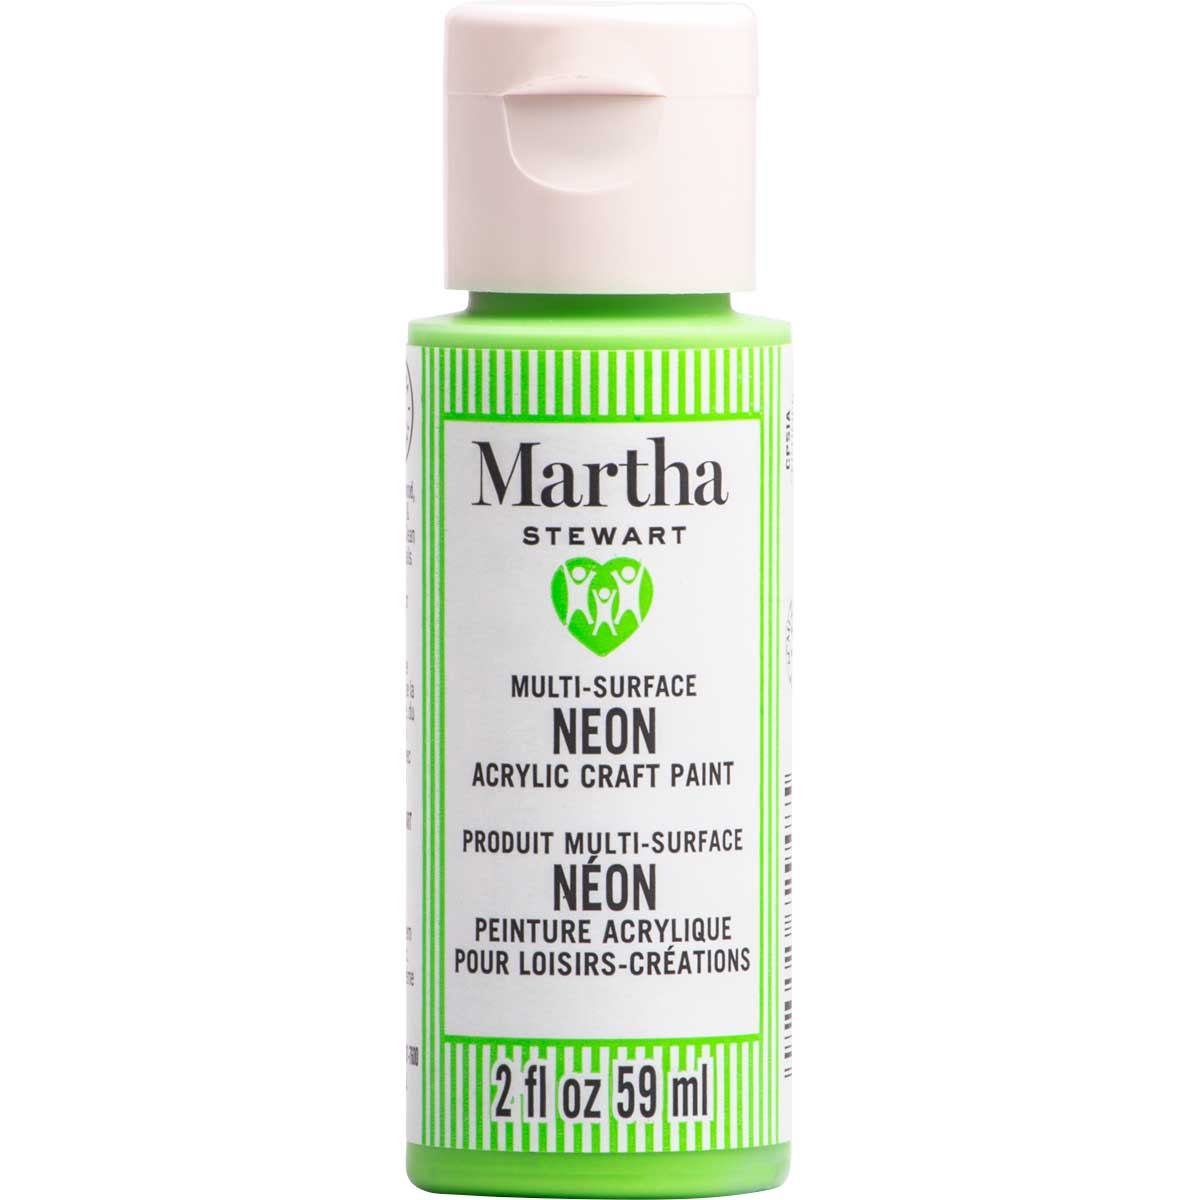 Martha Stewart® 2oz Multi-Surface Neon Acrylic Craft Paint - Green Frog